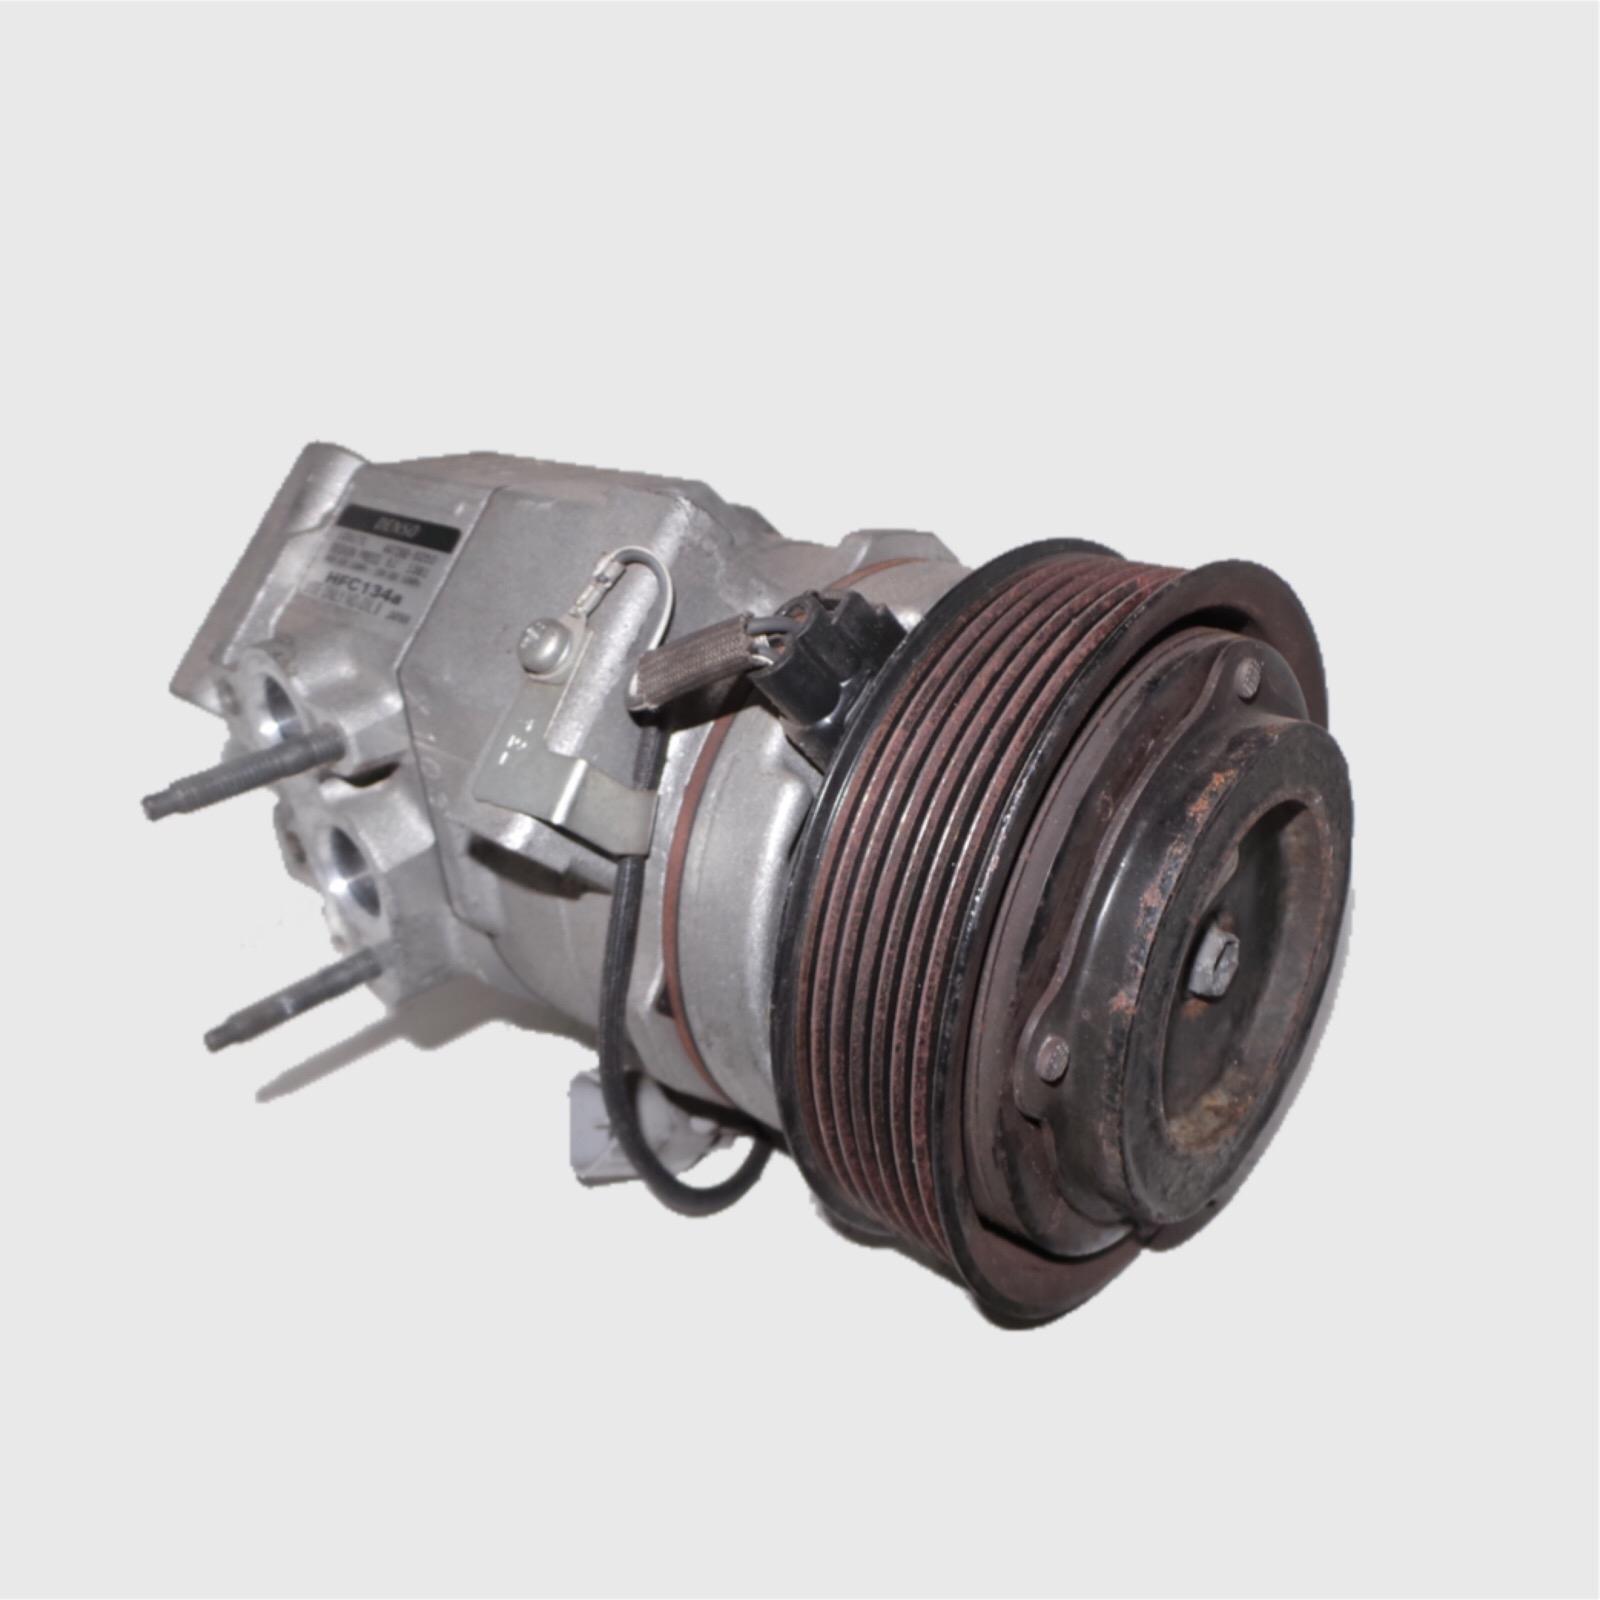 TOYOTA PRADO, A/C Compressor, 120 SERIES, 3.0, 1KD-FTV, DIESEL, TURBO, 11/06-10/09